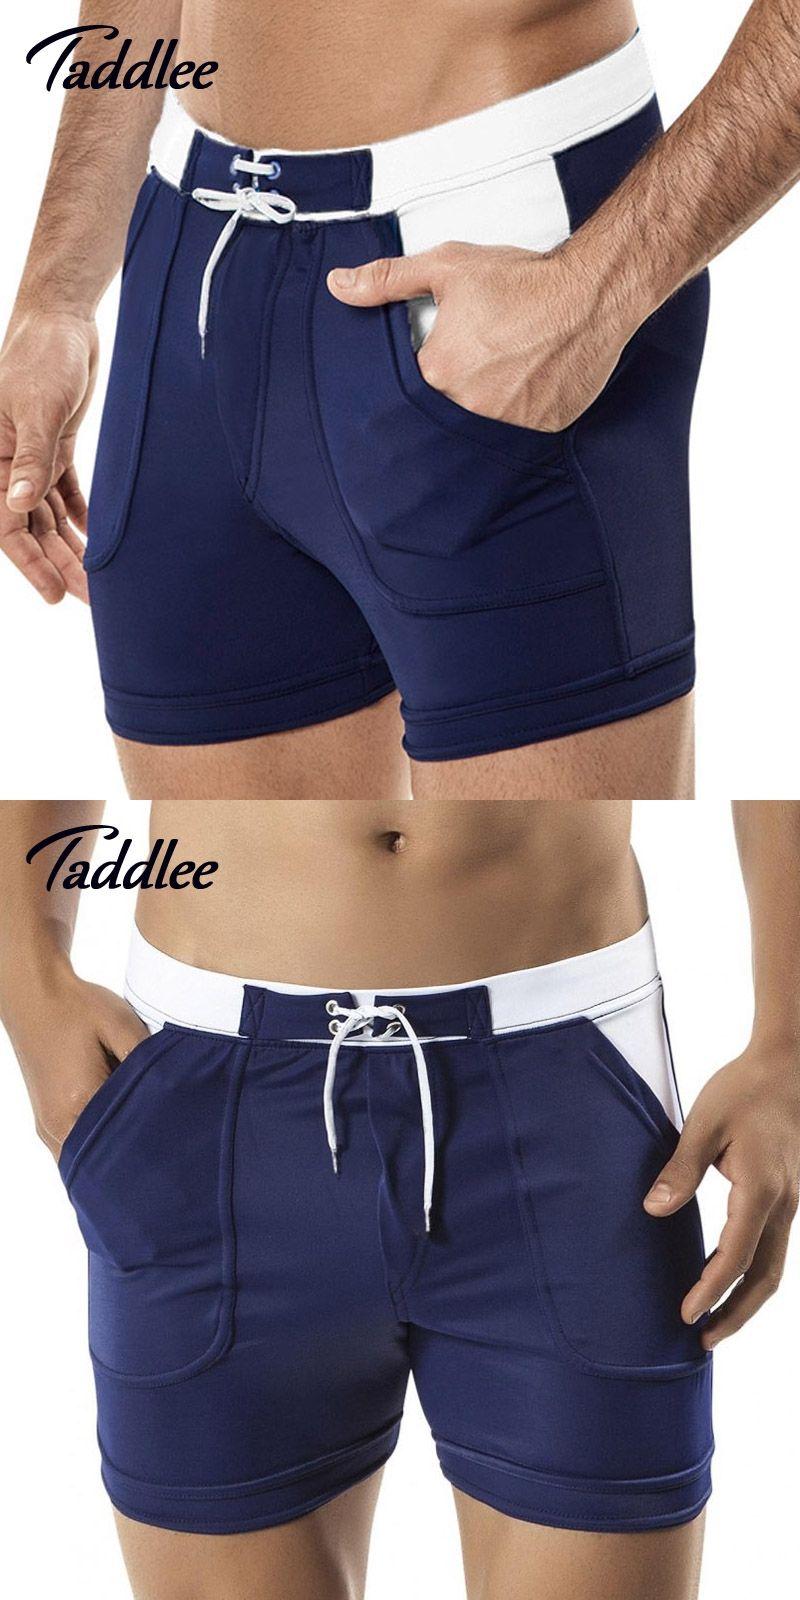 2bafb72c06b60 Taddlee Brand Man Men's Swimwear Swim Beach Board shorts swim trunks  Swimsuits Bathing Suits Men Swimming